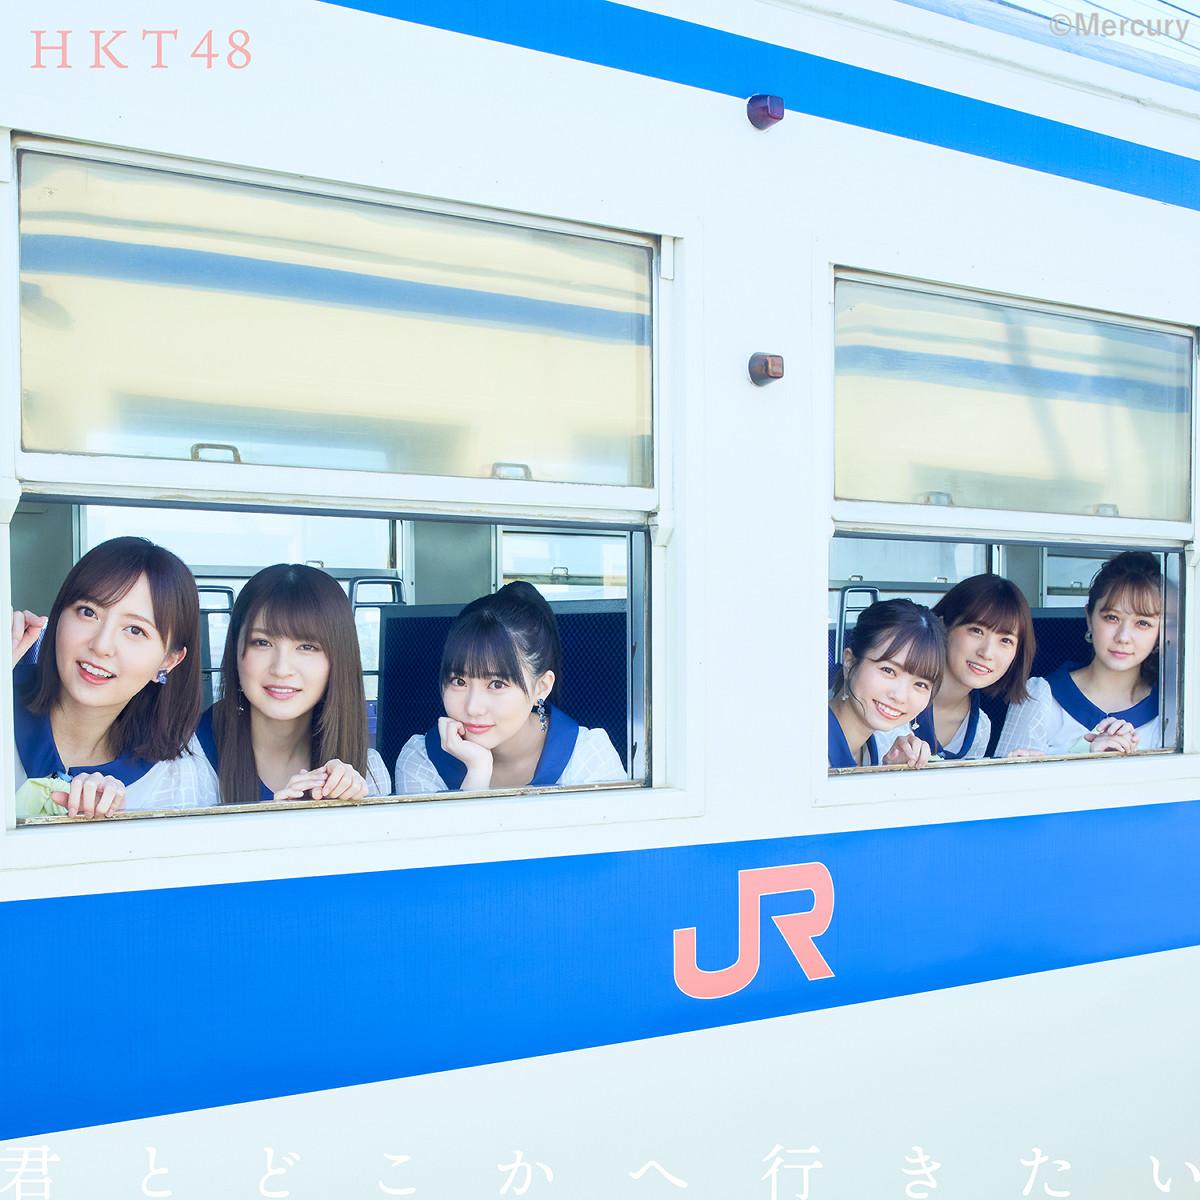 HKT48新曲「君とどこかへ行きたい」tipeA ジャケット写真(c)Mercury